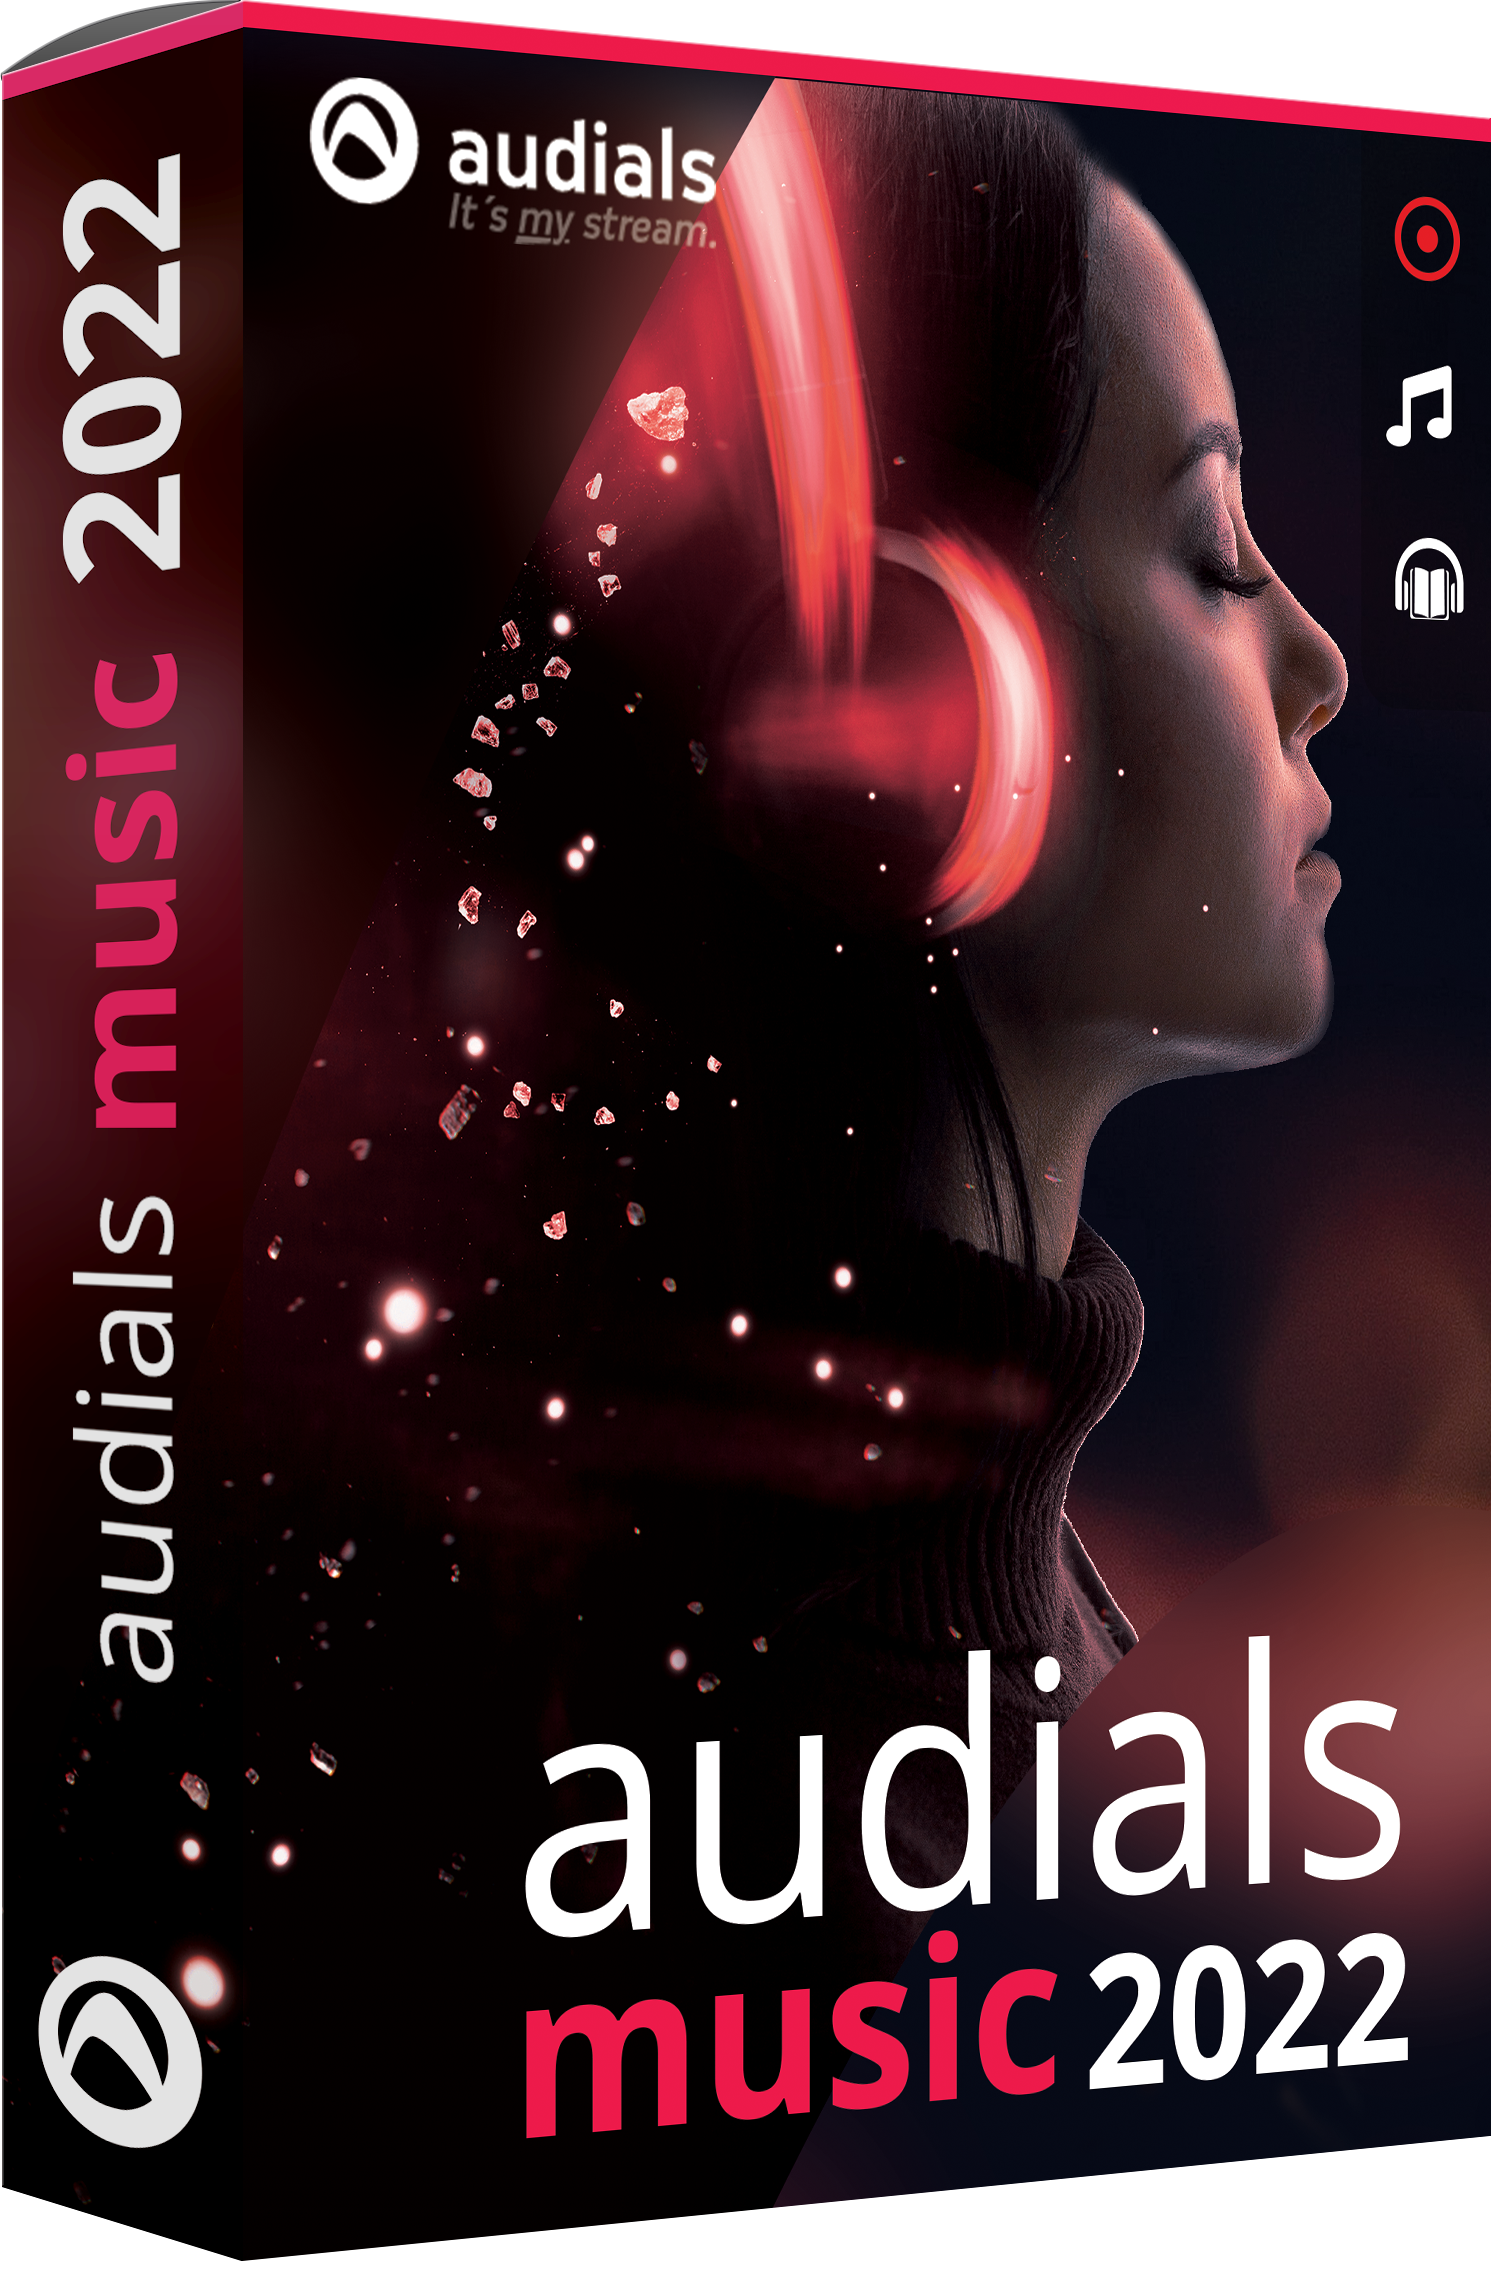 Audials Music 2022